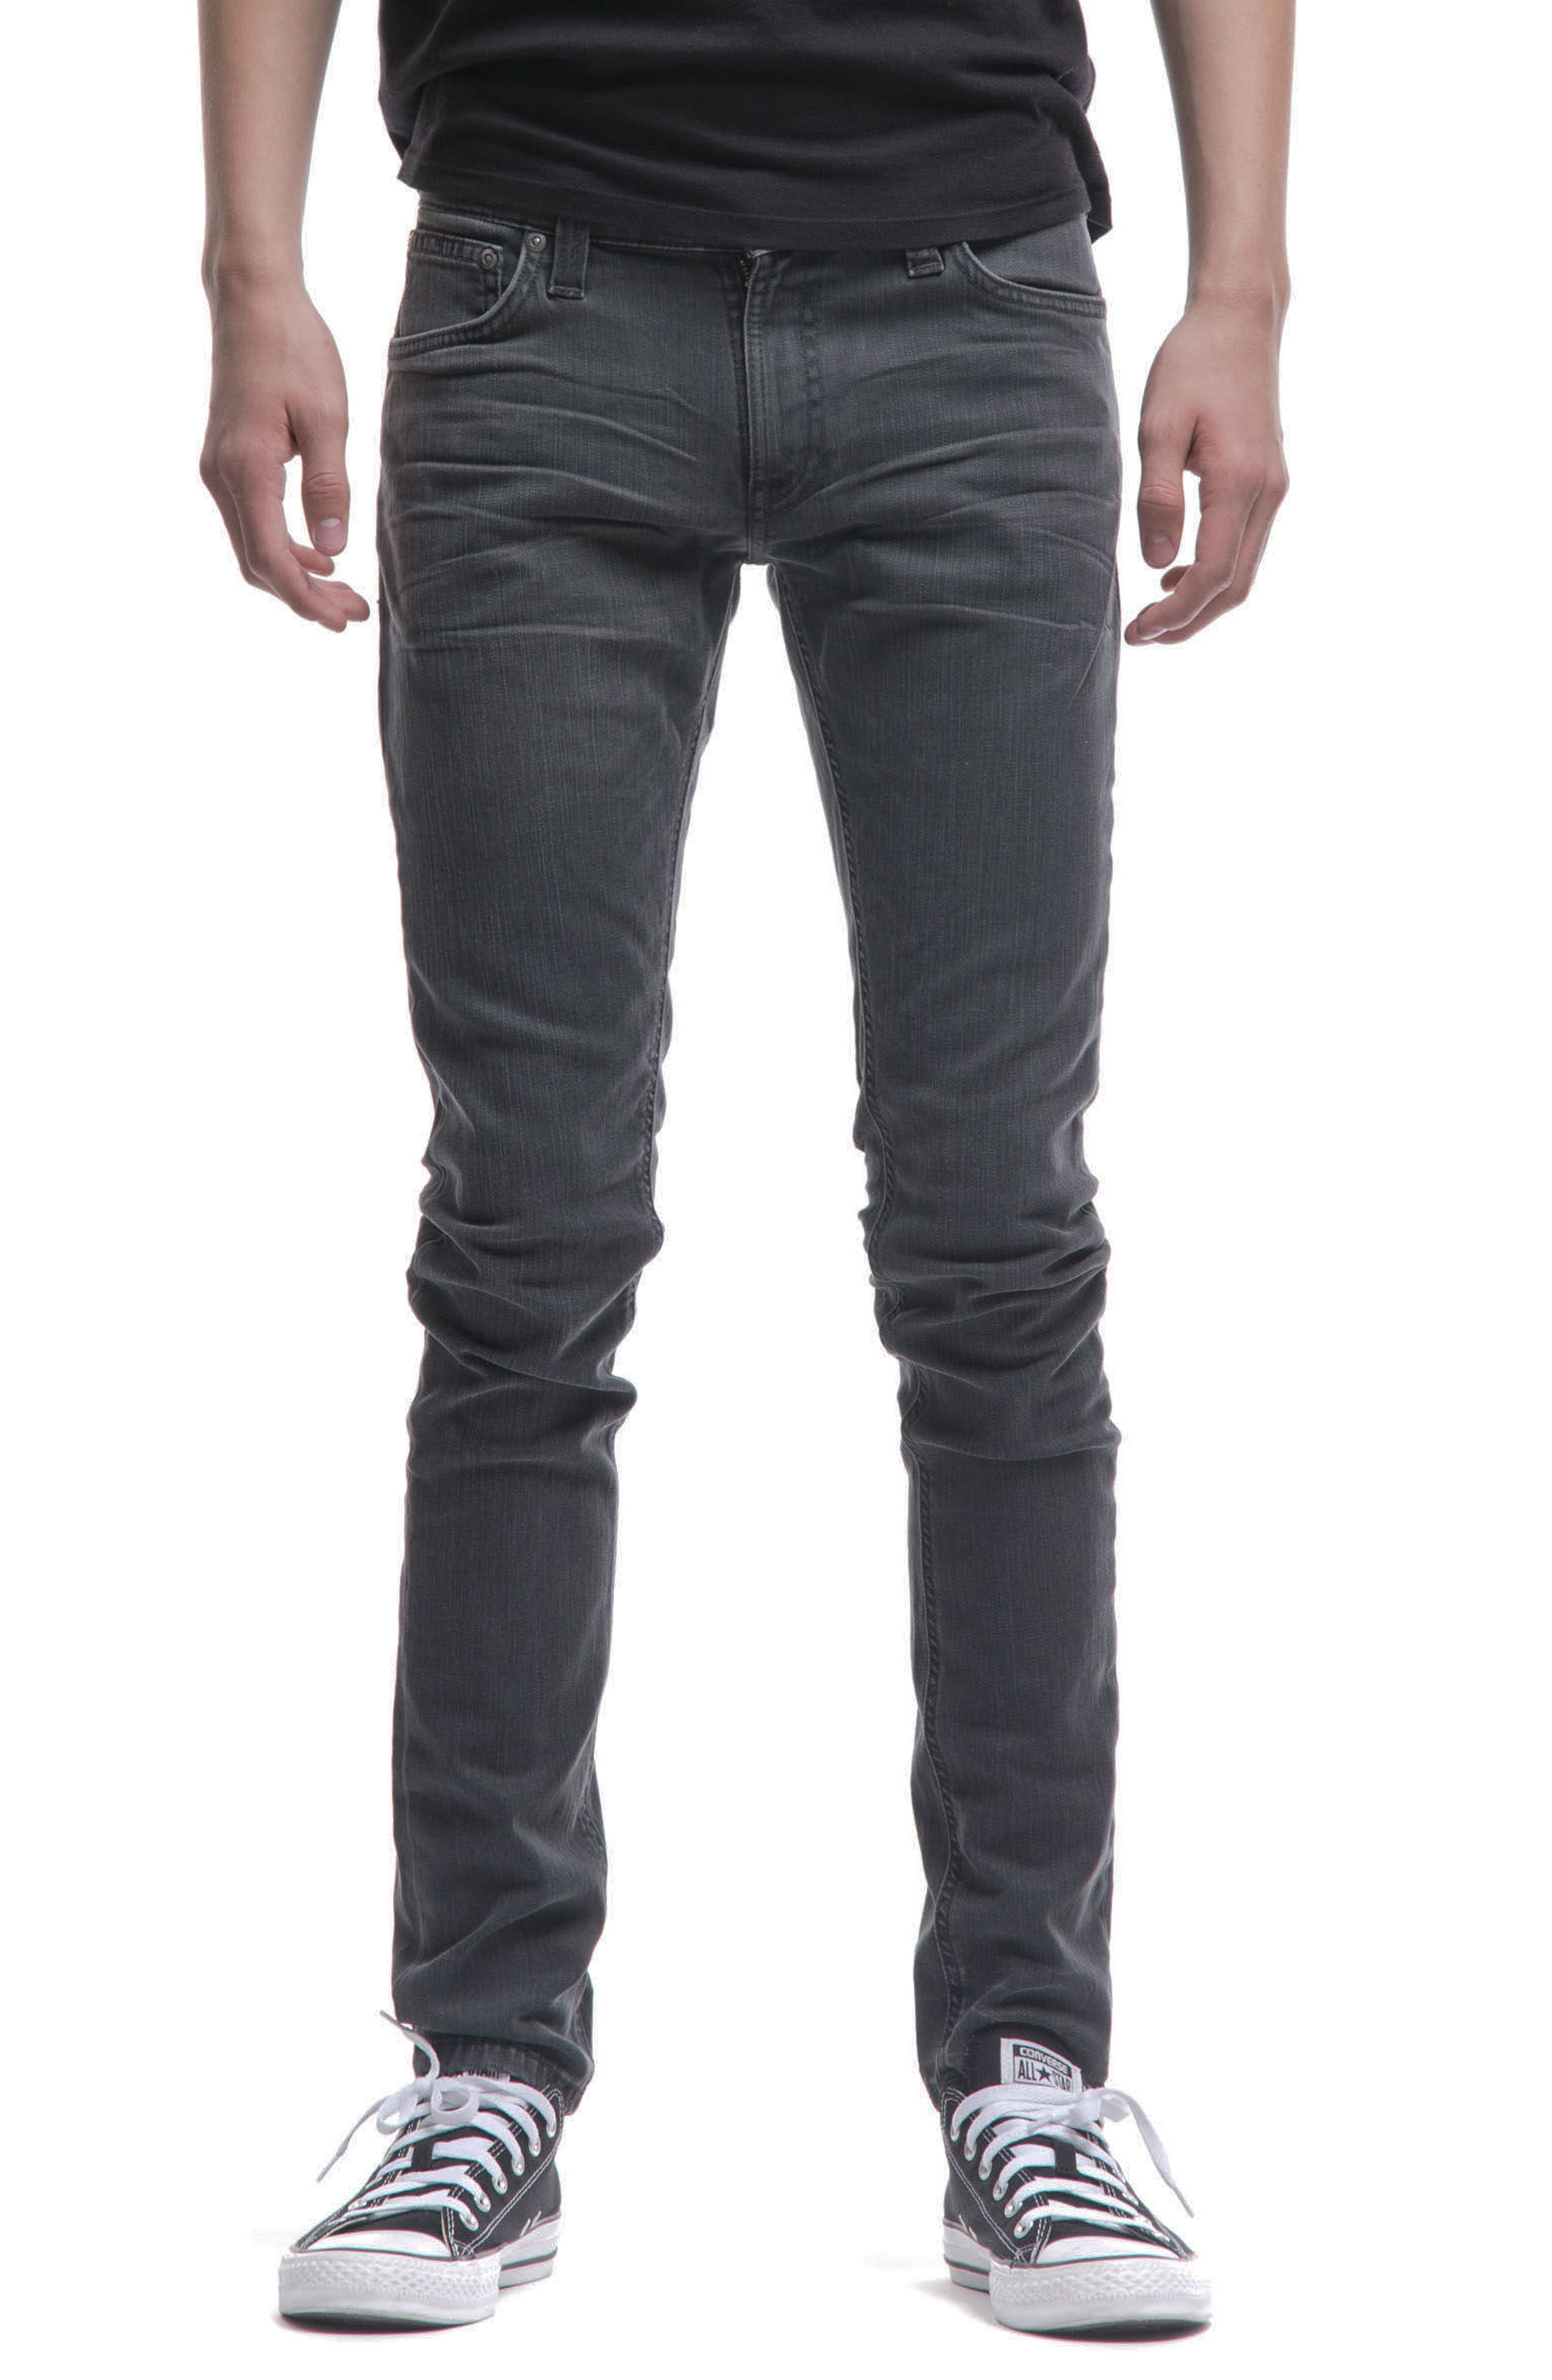 Skinny Lin Skinny Fit Jeans,                         Main,                         color,